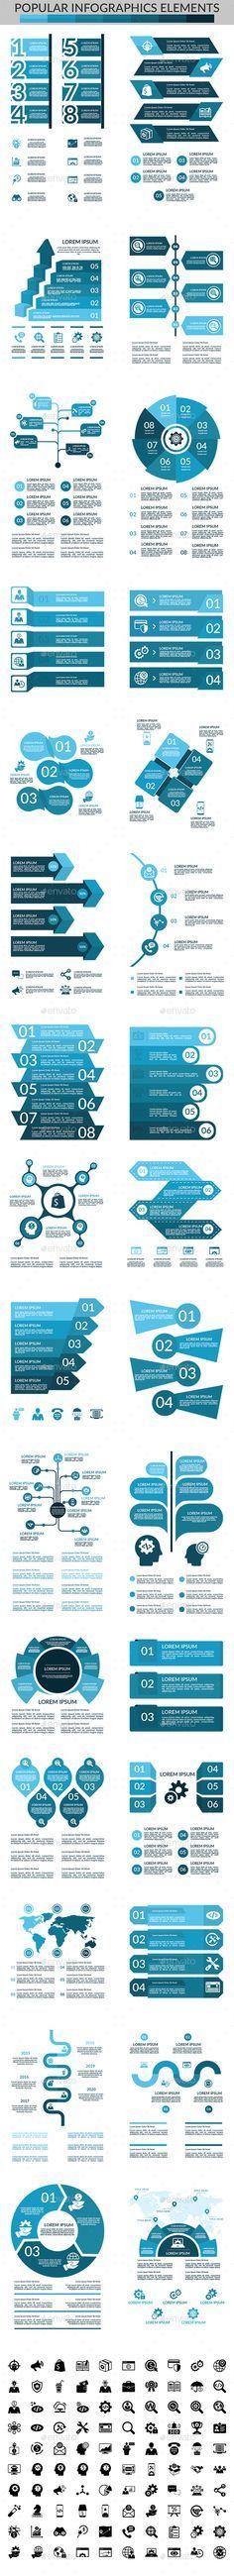 30 Popular Infographic Elements - Infographics